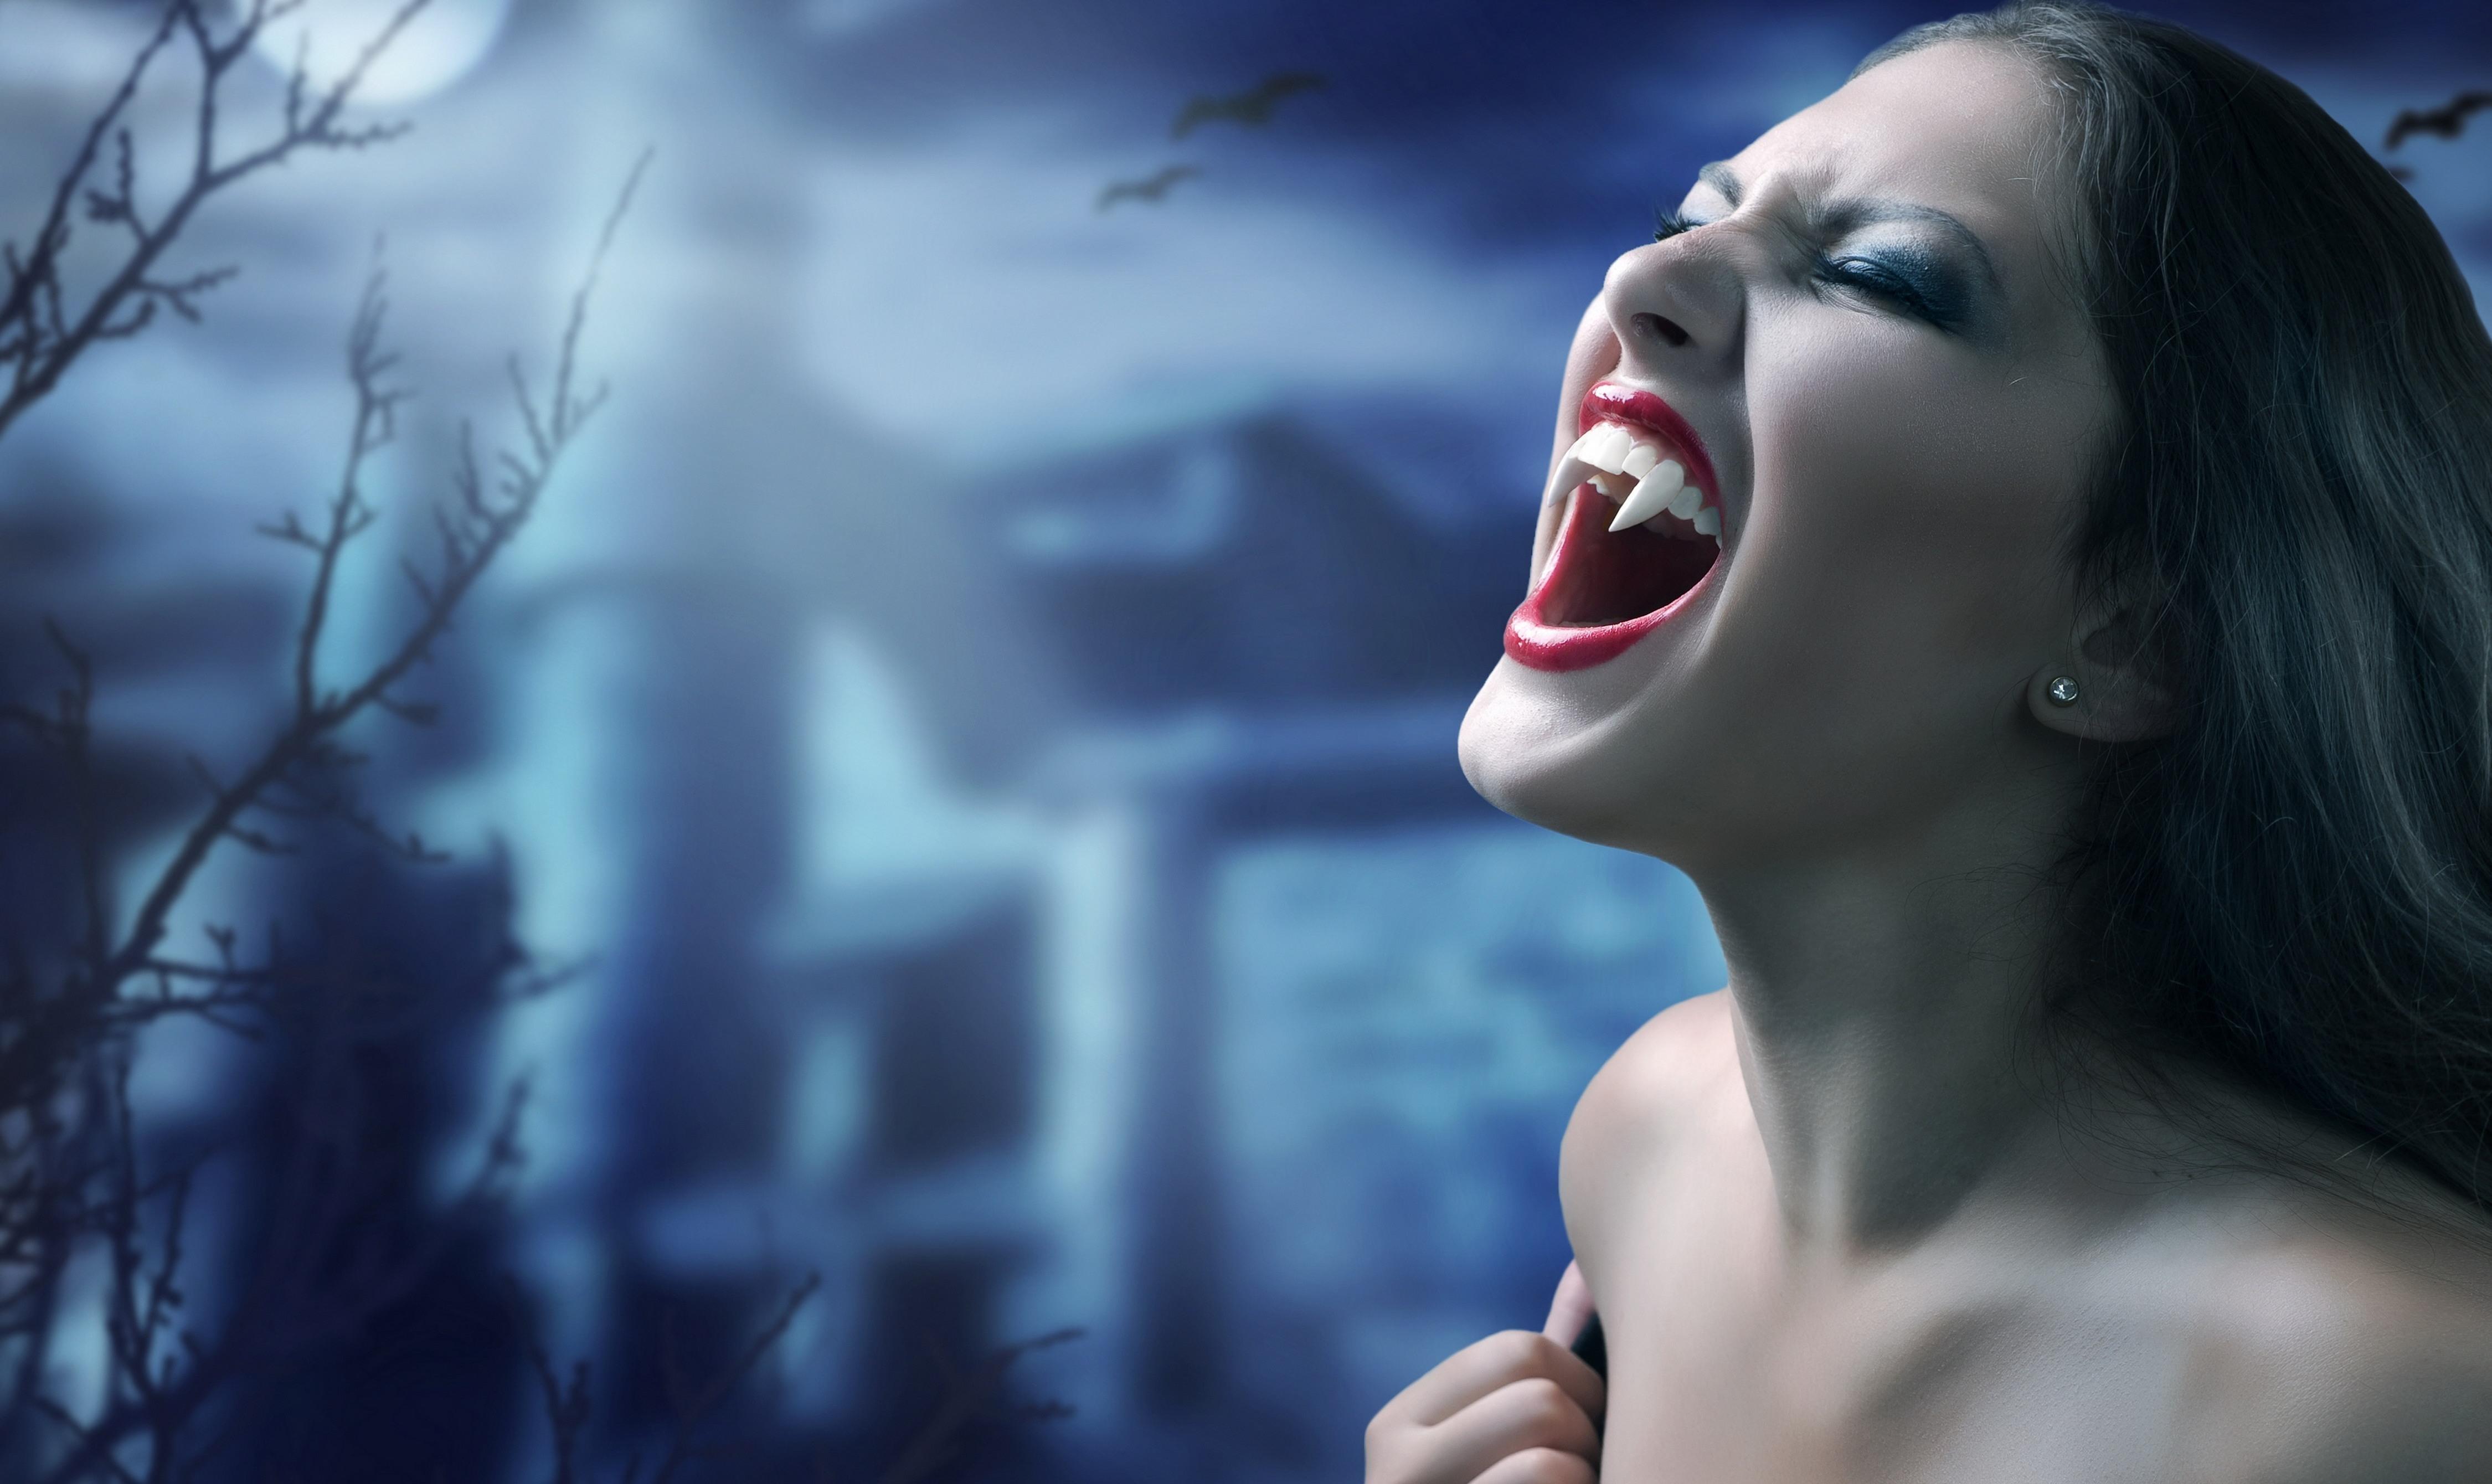 вампиры графика: